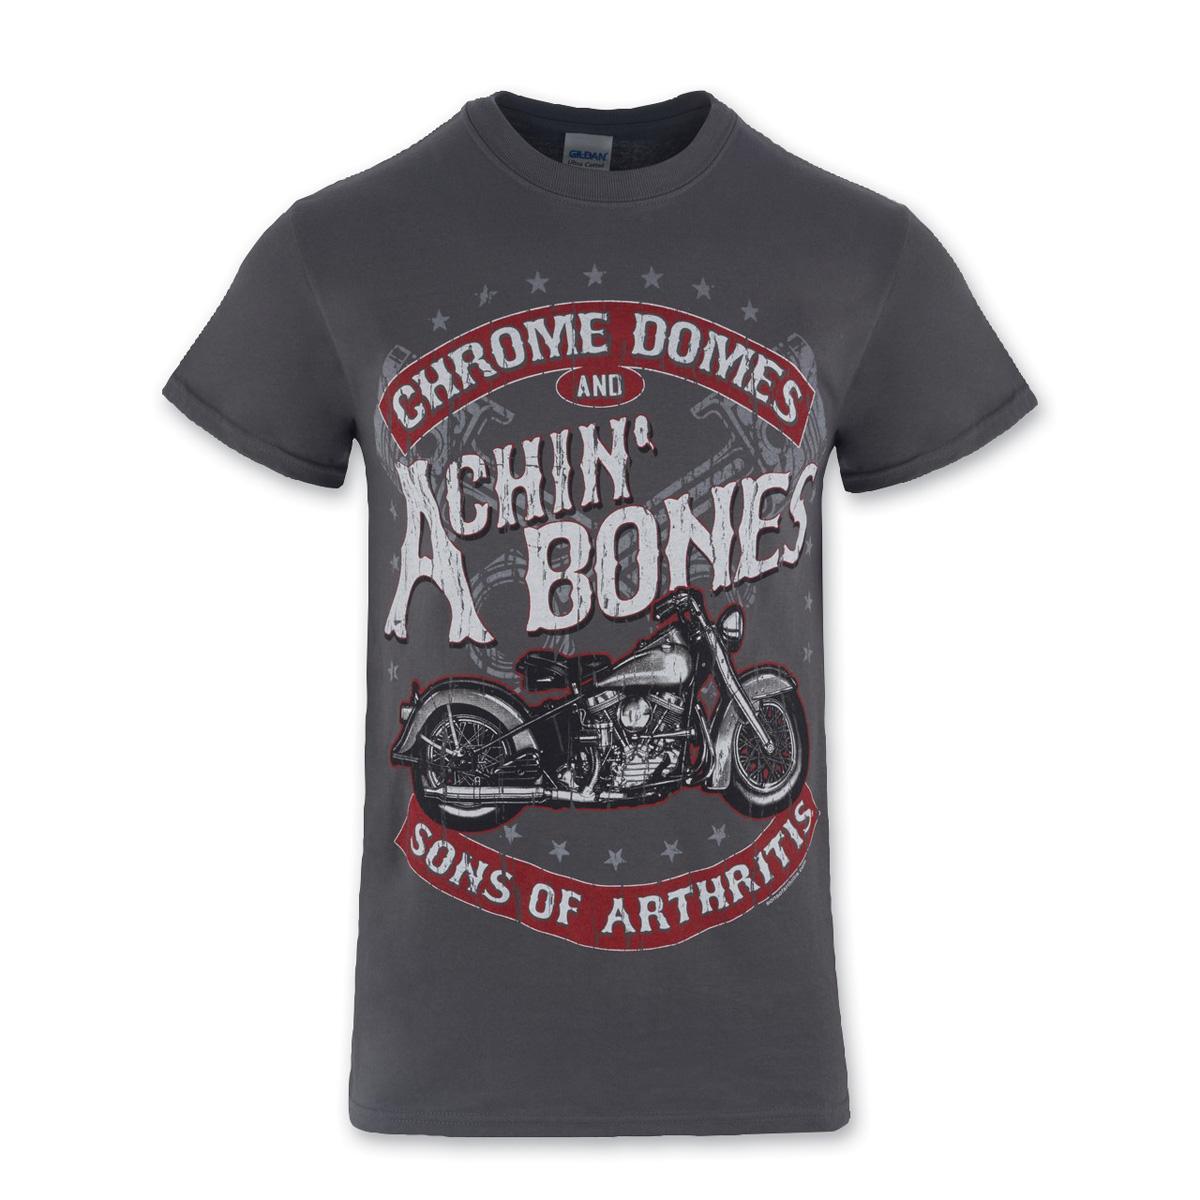 sons of arthritis men 39 s achin 39 bones charcoal t shirt. Black Bedroom Furniture Sets. Home Design Ideas